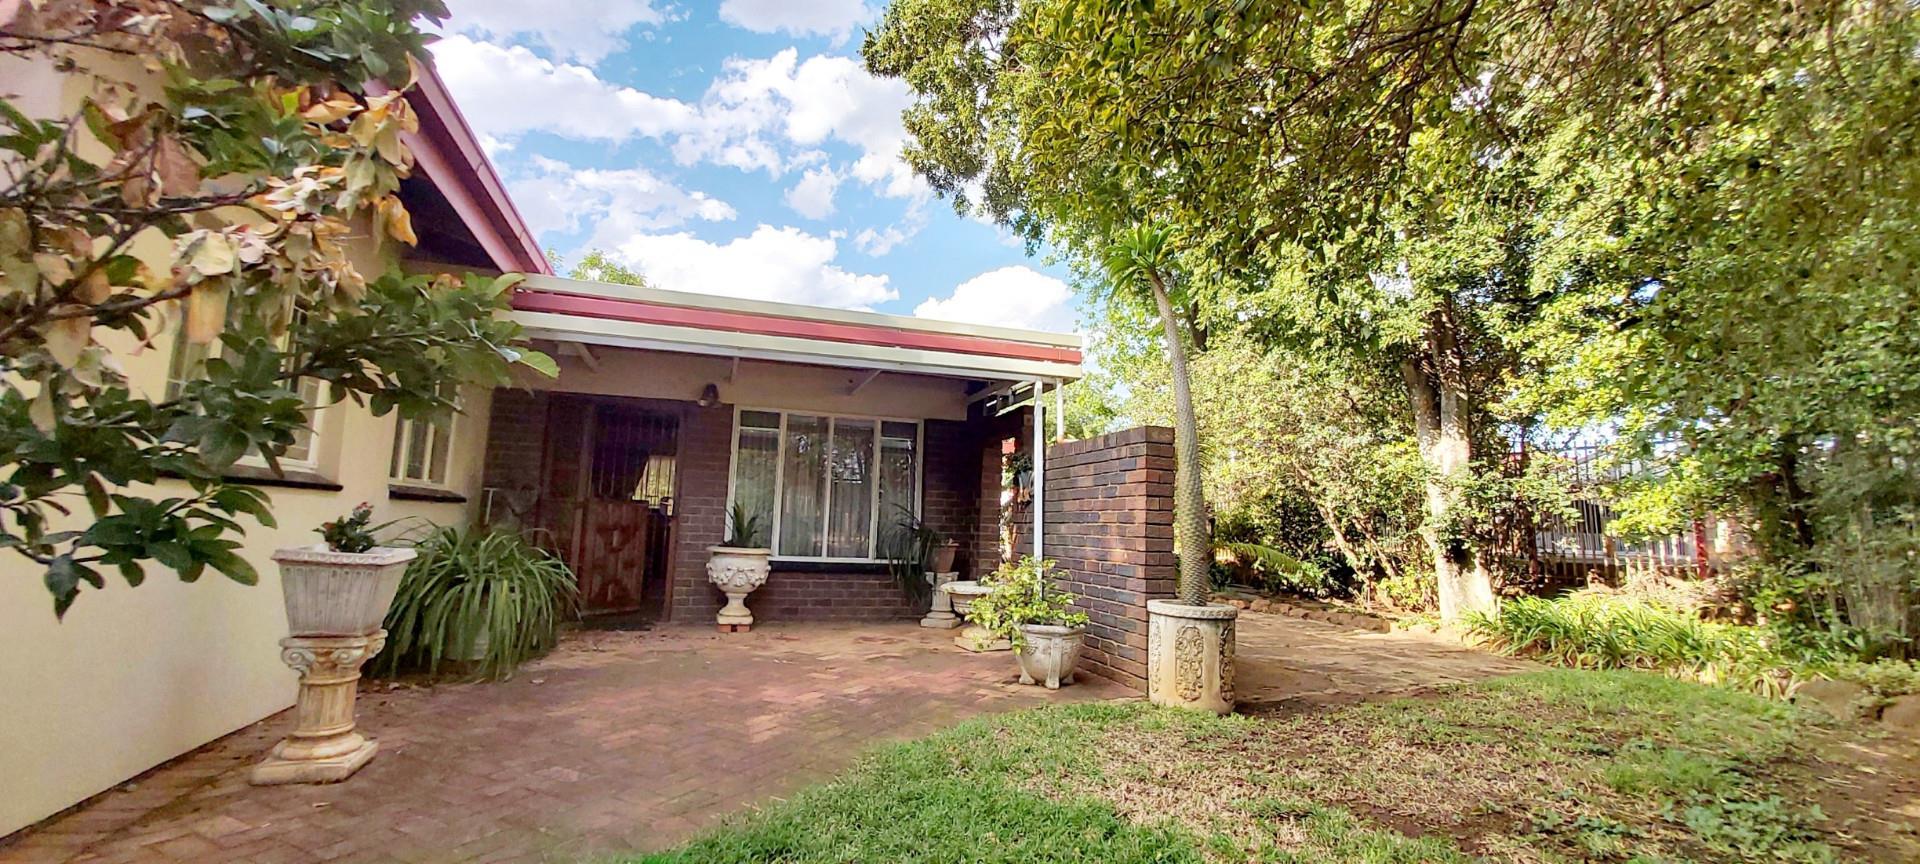 3 Bedroom House For Sale in Roseville